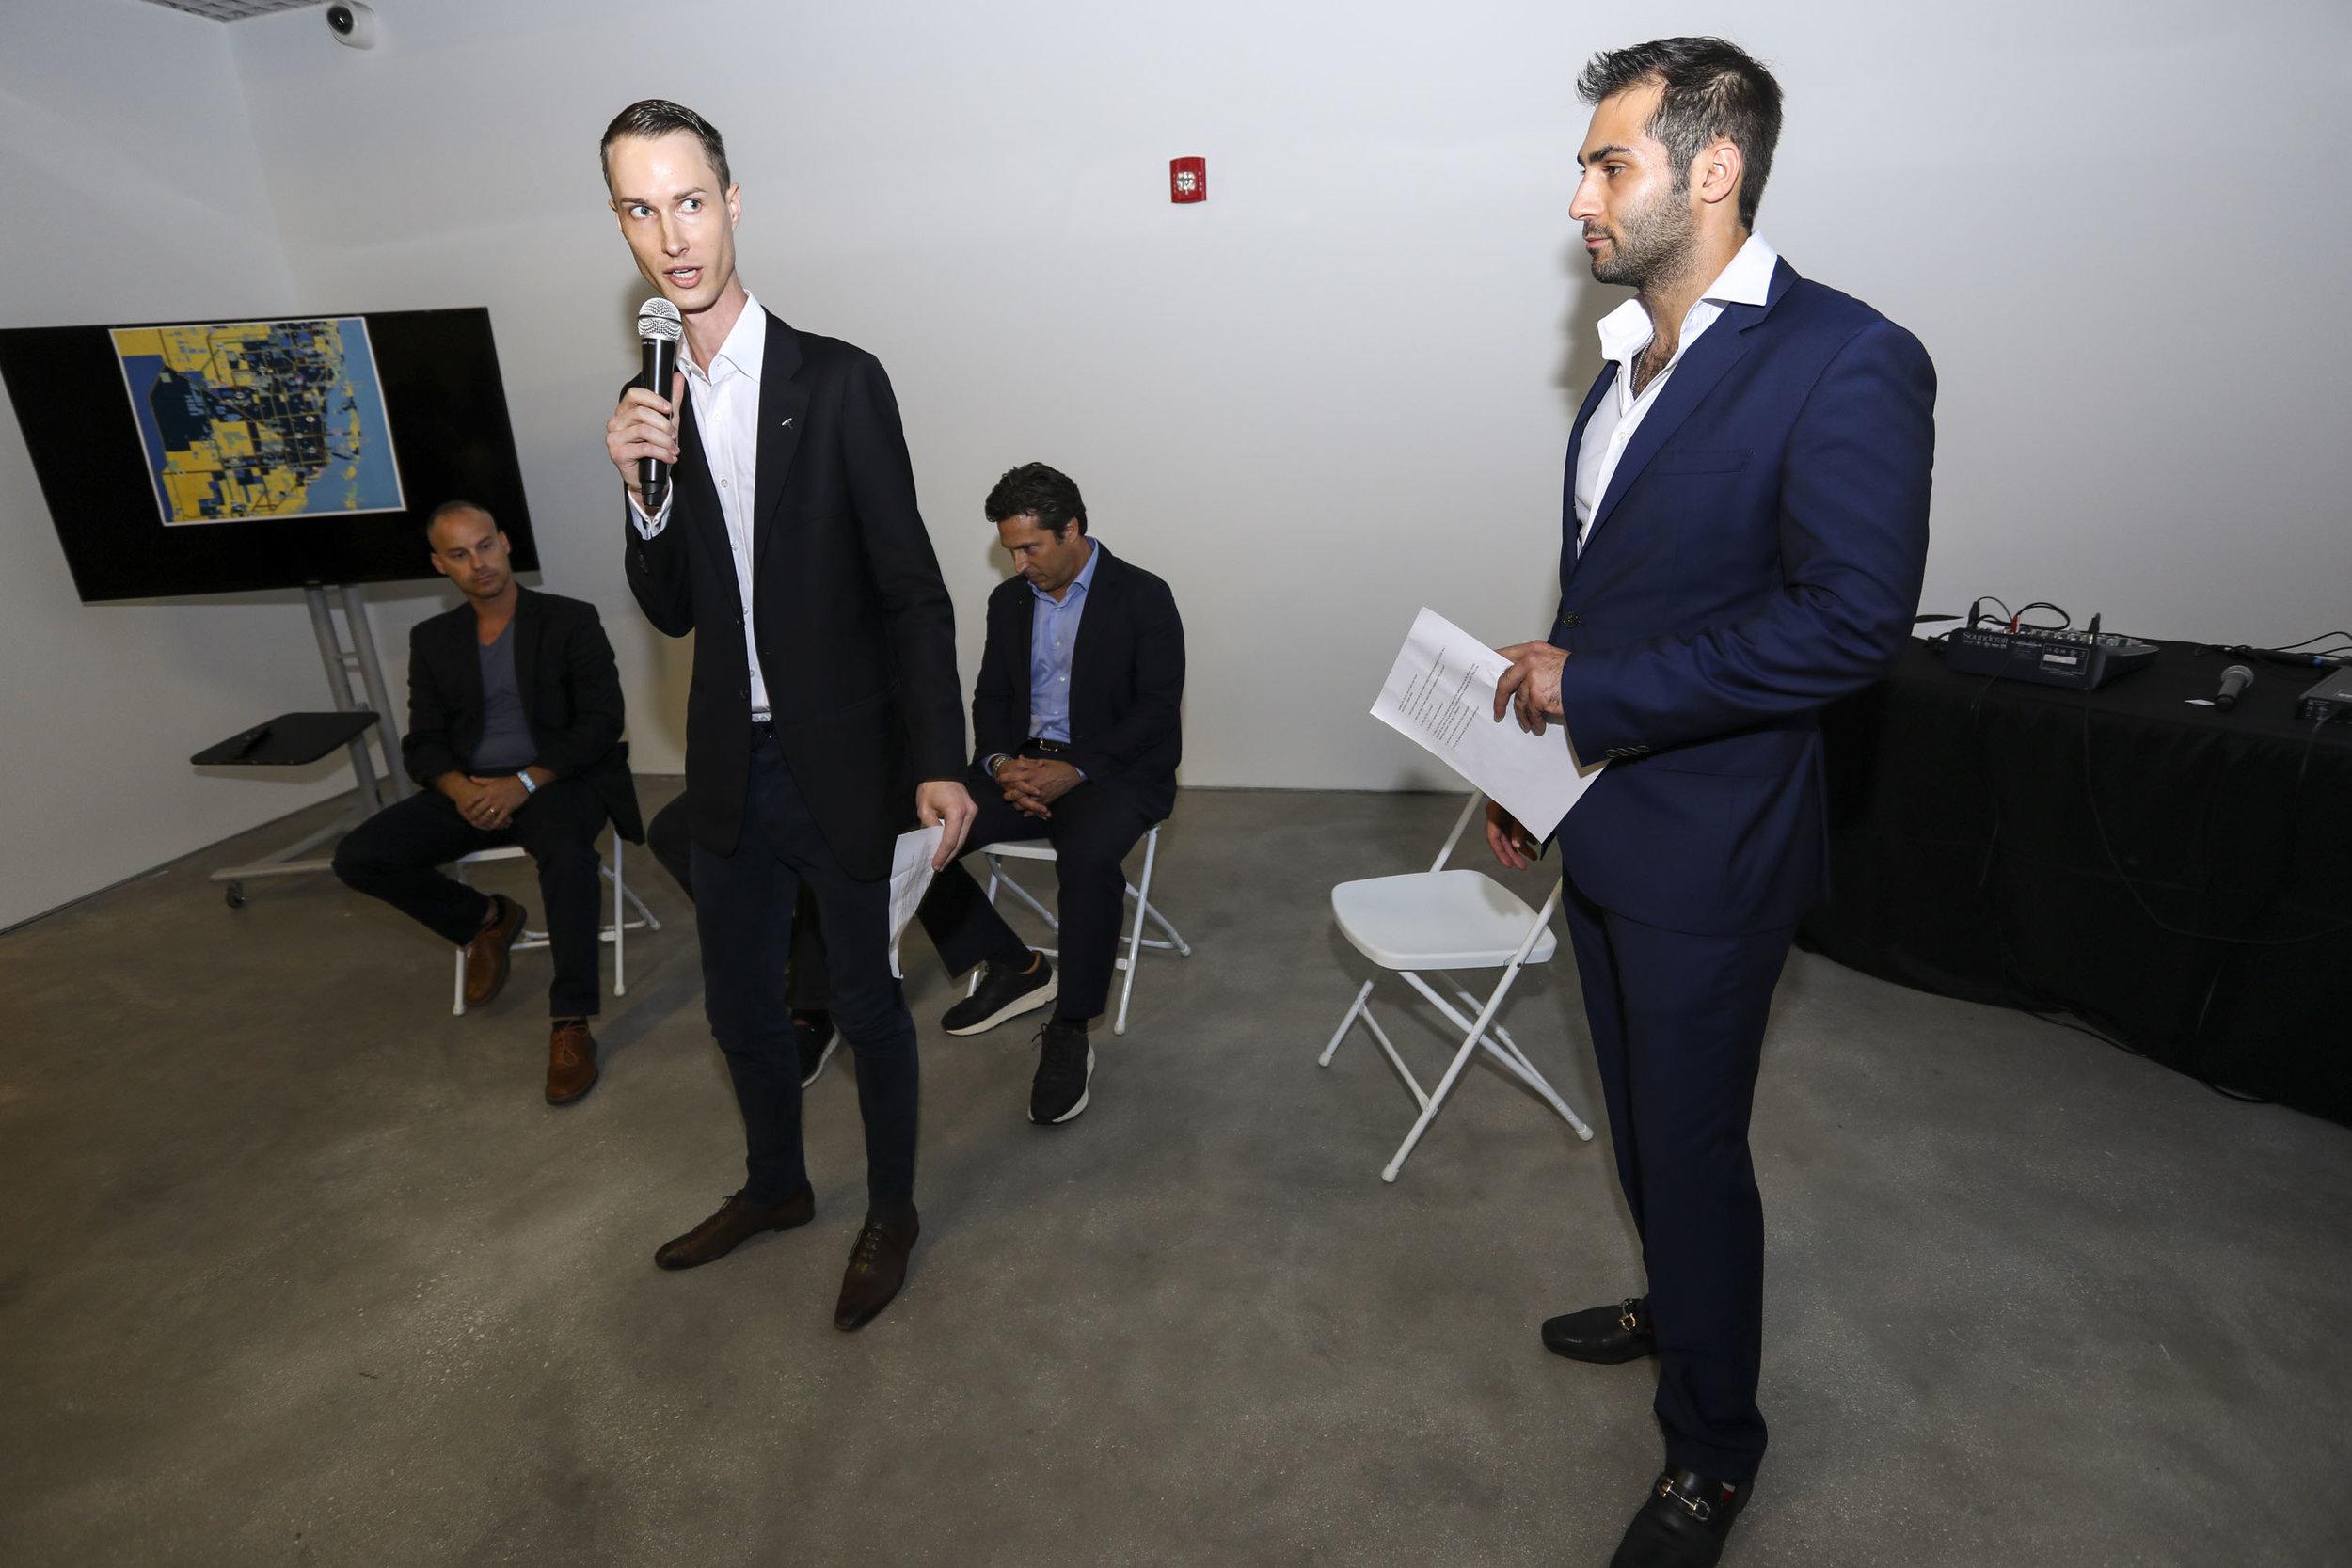 James Bennett & Demetri Demascus Inside The PROFILEmiami Fall Real Estate Showcase & Forum 2018